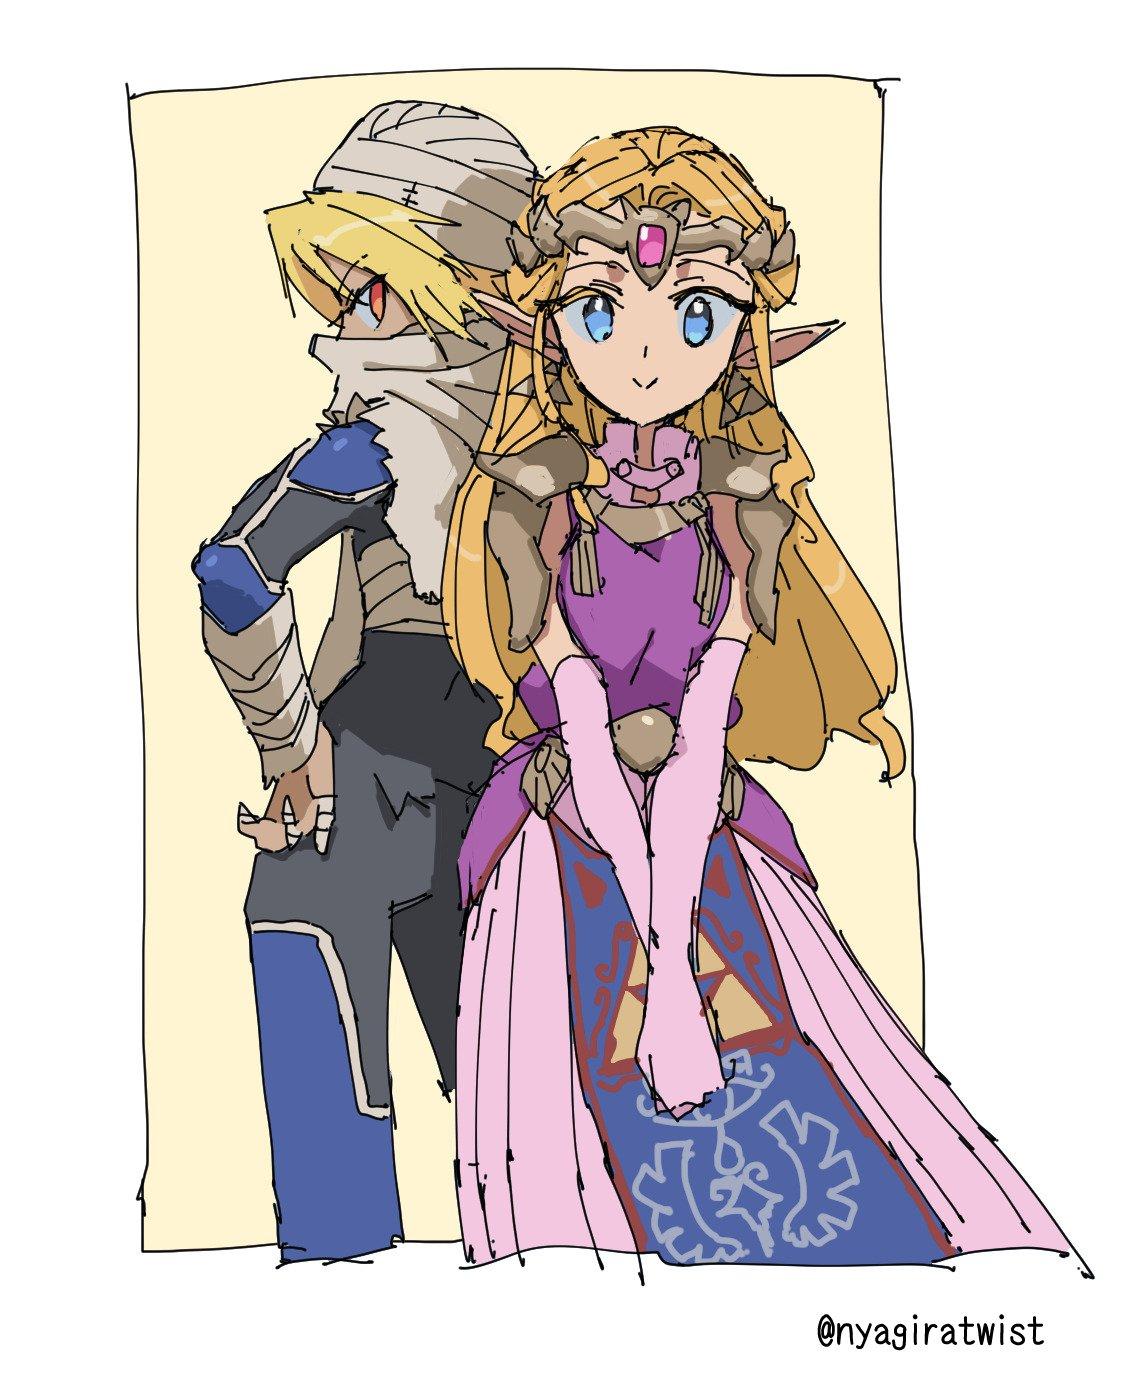 2girls blonde_hair blue_eyes dual_persona highres multiple_girls nintendo nyagiratwist princess_zelda red_eyes sheik the_legend_of_zelda the_legend_of_zelda:_ocarina_of_time